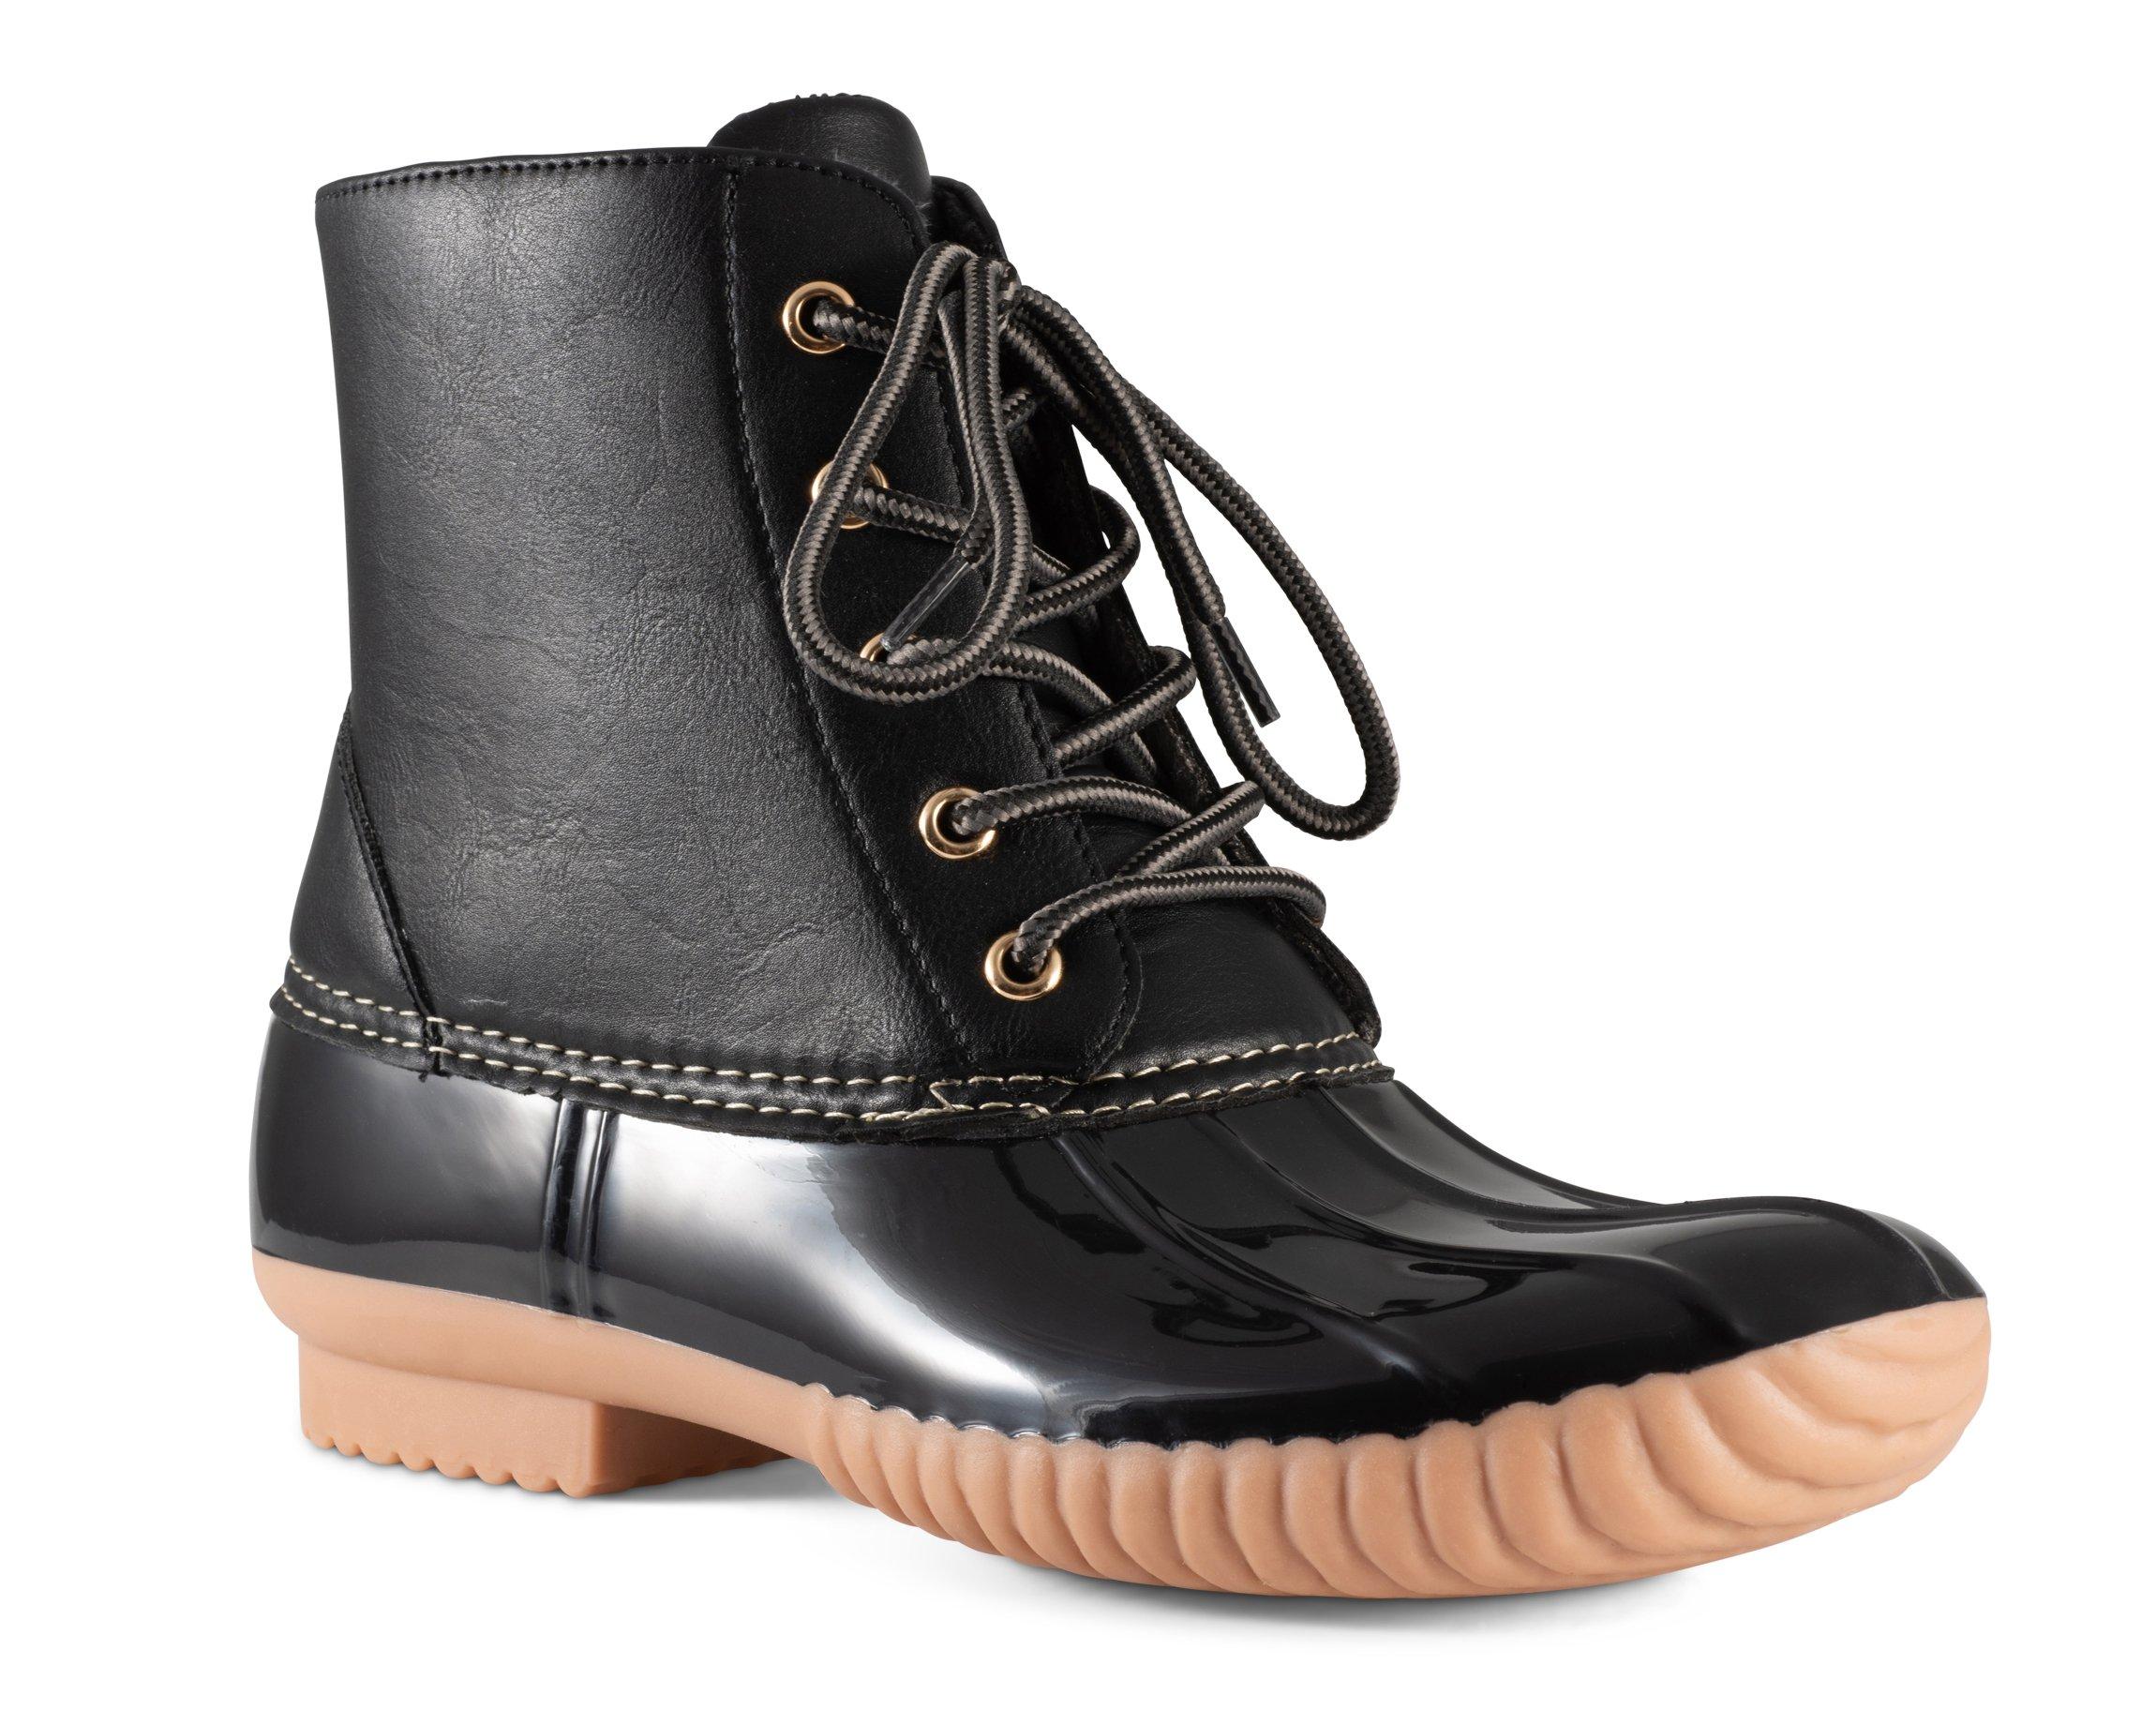 Twisted Women's Becca Two-Tone Insulated Duck Rain Boot- BECCA04 Black/Black, Size 10